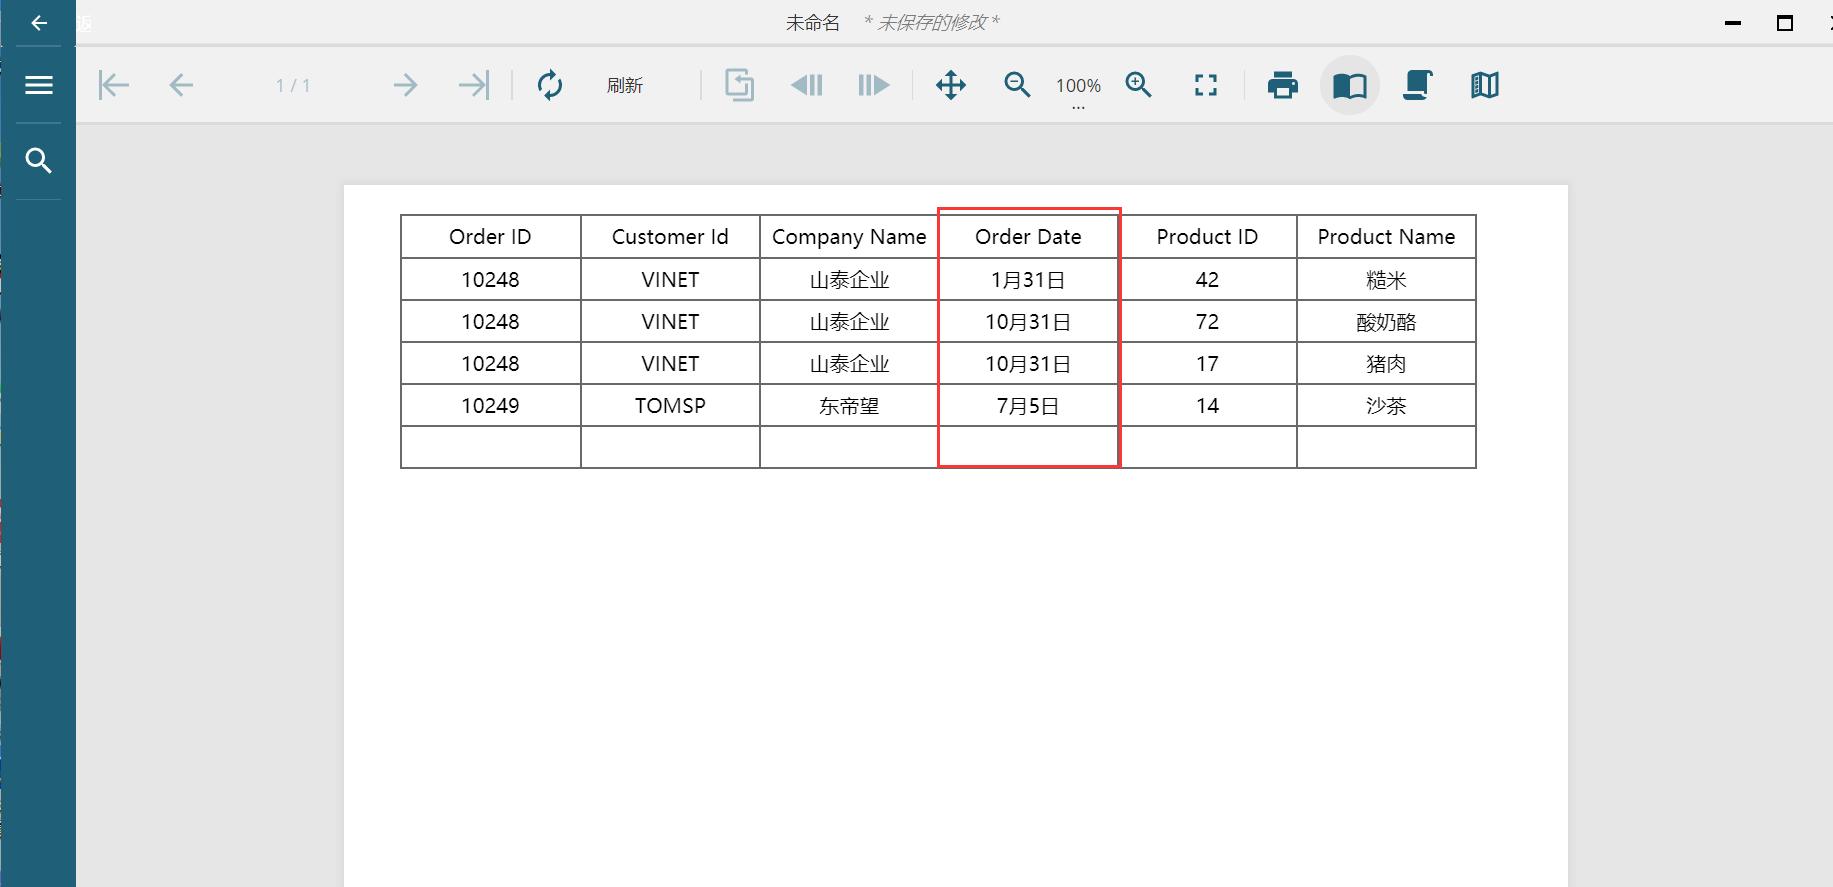 .NET报表控件ActiveReports使用教程:如何进行时间格式设置 - 图集3